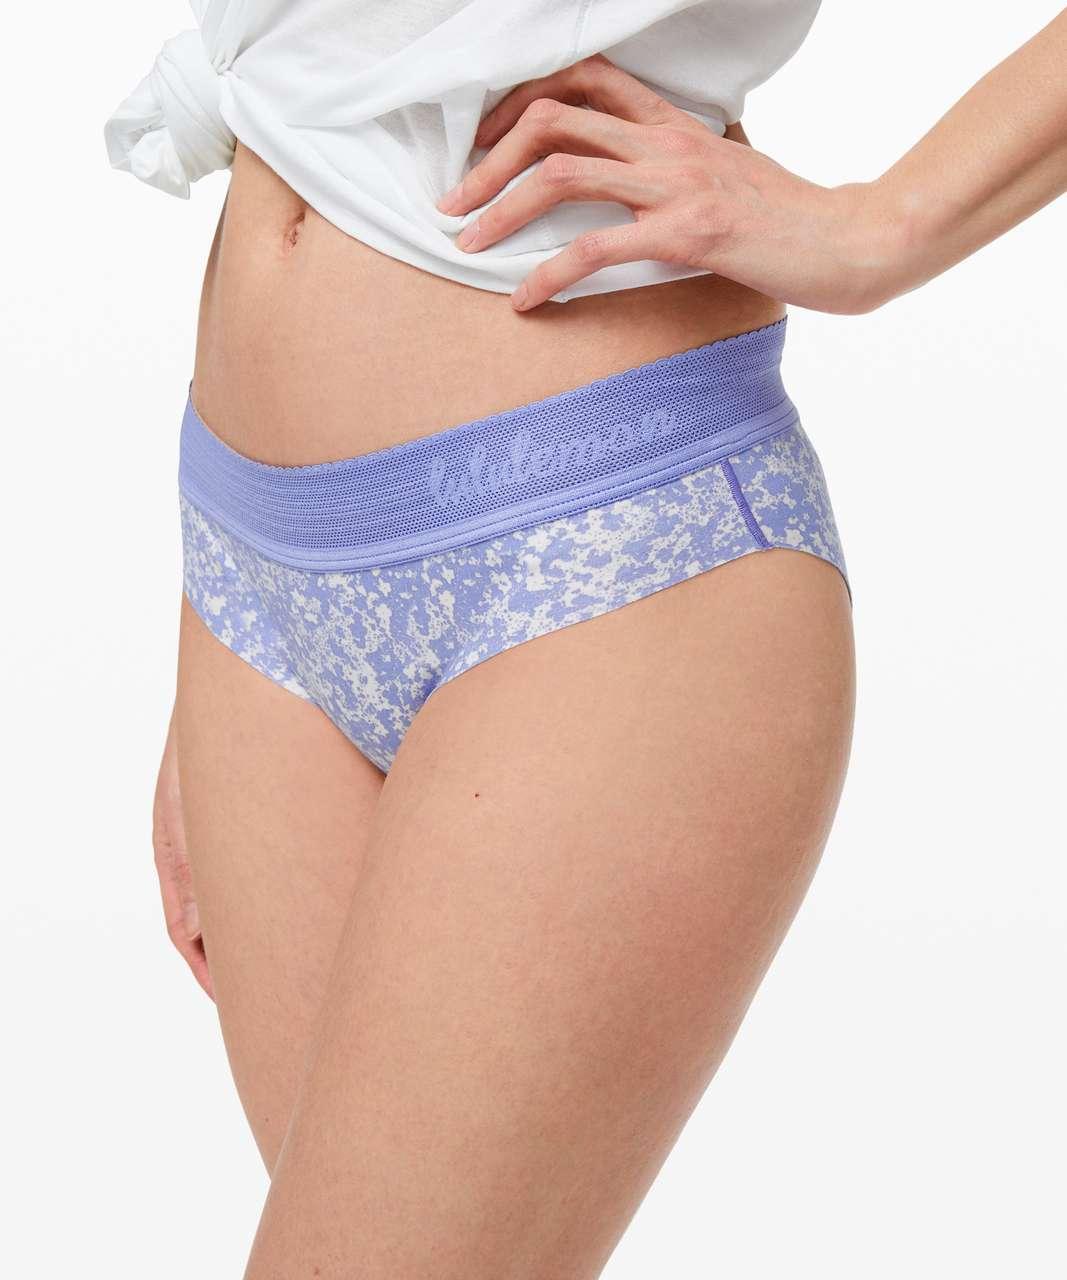 Lululemon Ever Essentials Bikini - Bloom Spray Light Chrome Hydrangea Blue / Hydrangea Blue